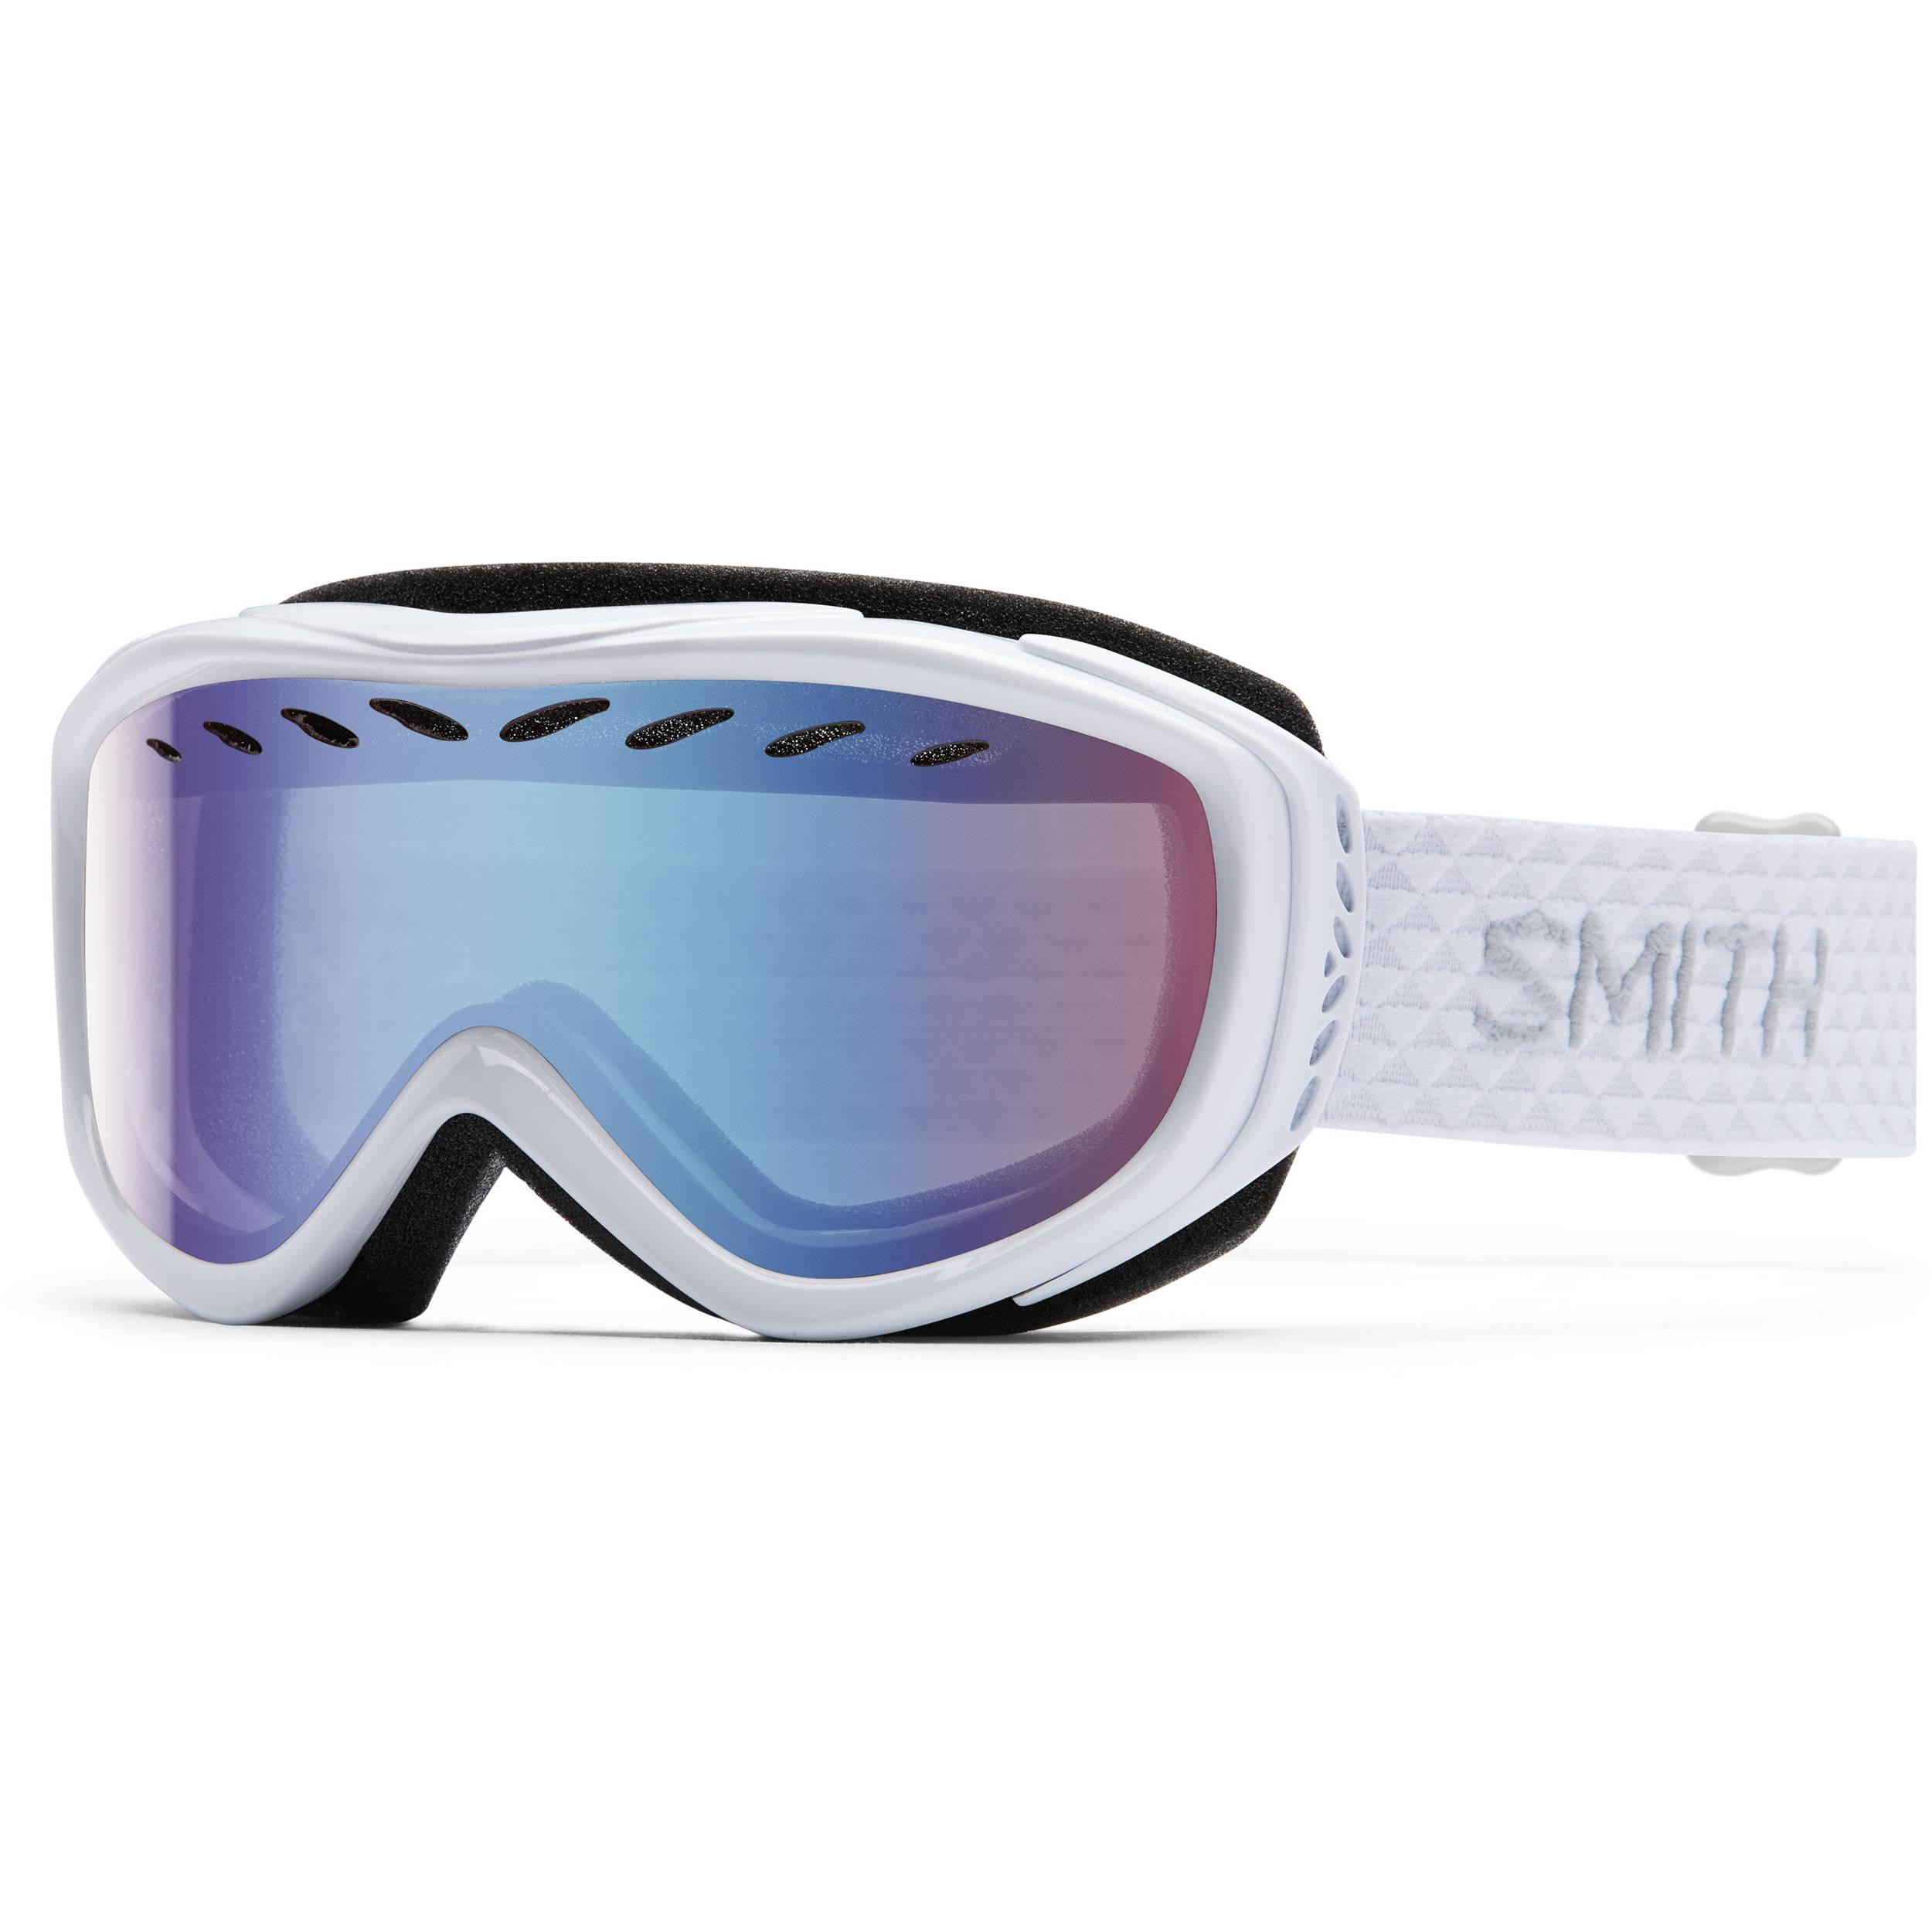 a91f66d46468 Smith Optics Women s-Fit Transit Snow Goggles TN3ZWT16 B H Photo